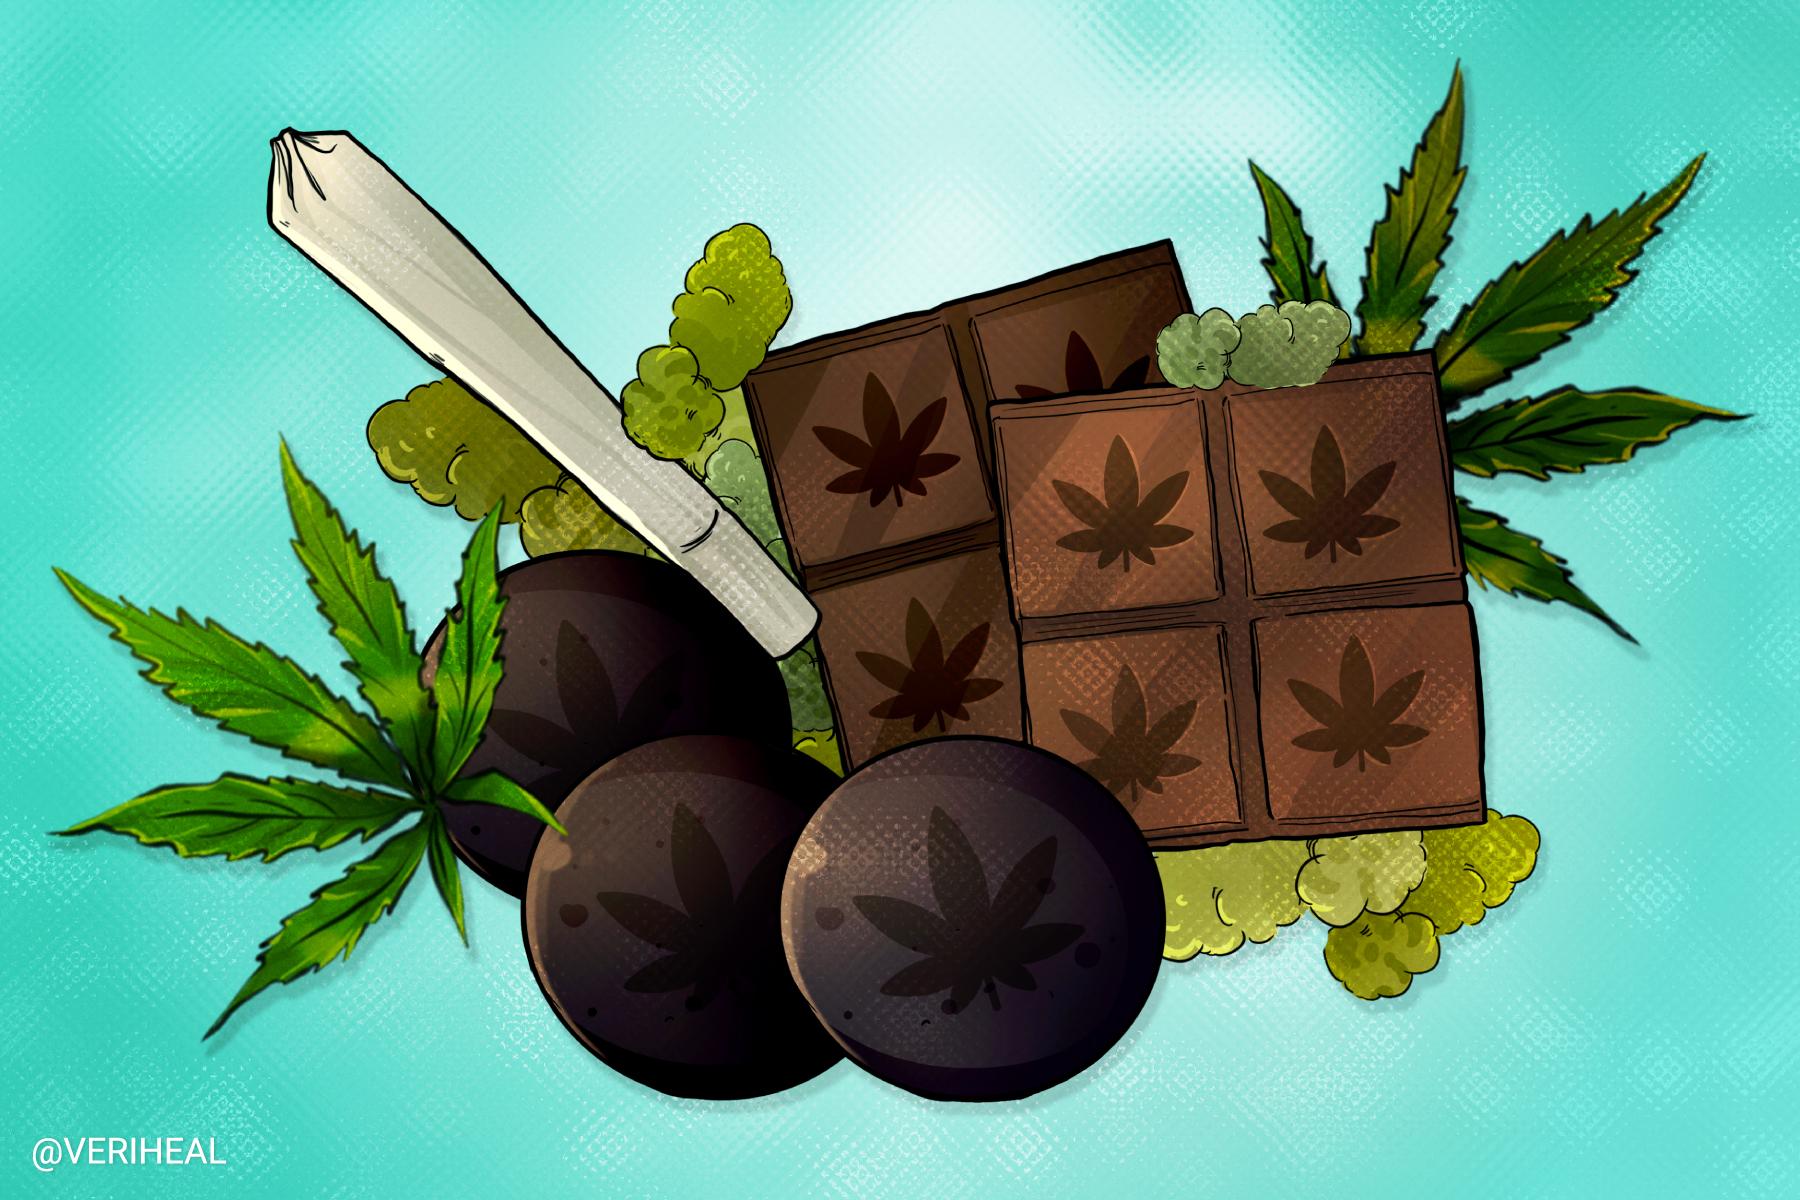 The Pros and Cons of Edible Marijuana vs Smoking